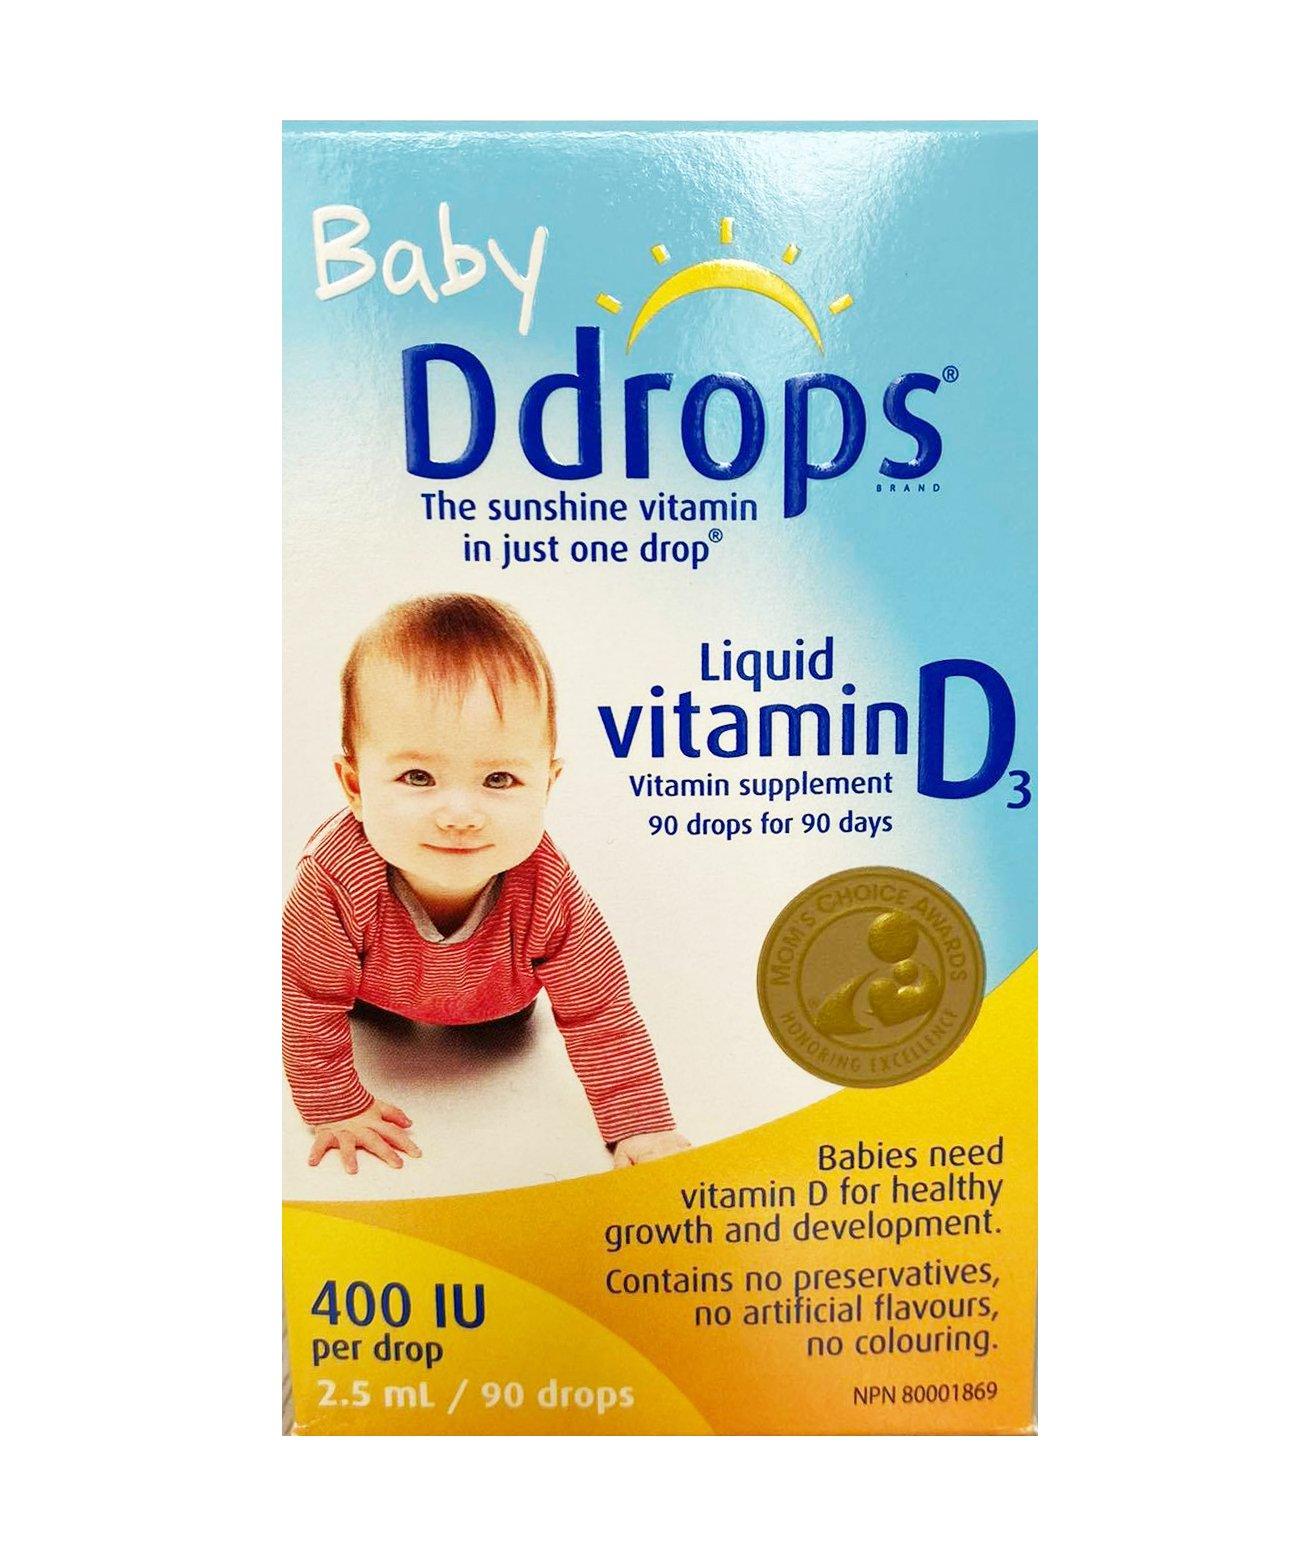 Baby Ddrops Vitamin D3 400IU mẫu mới